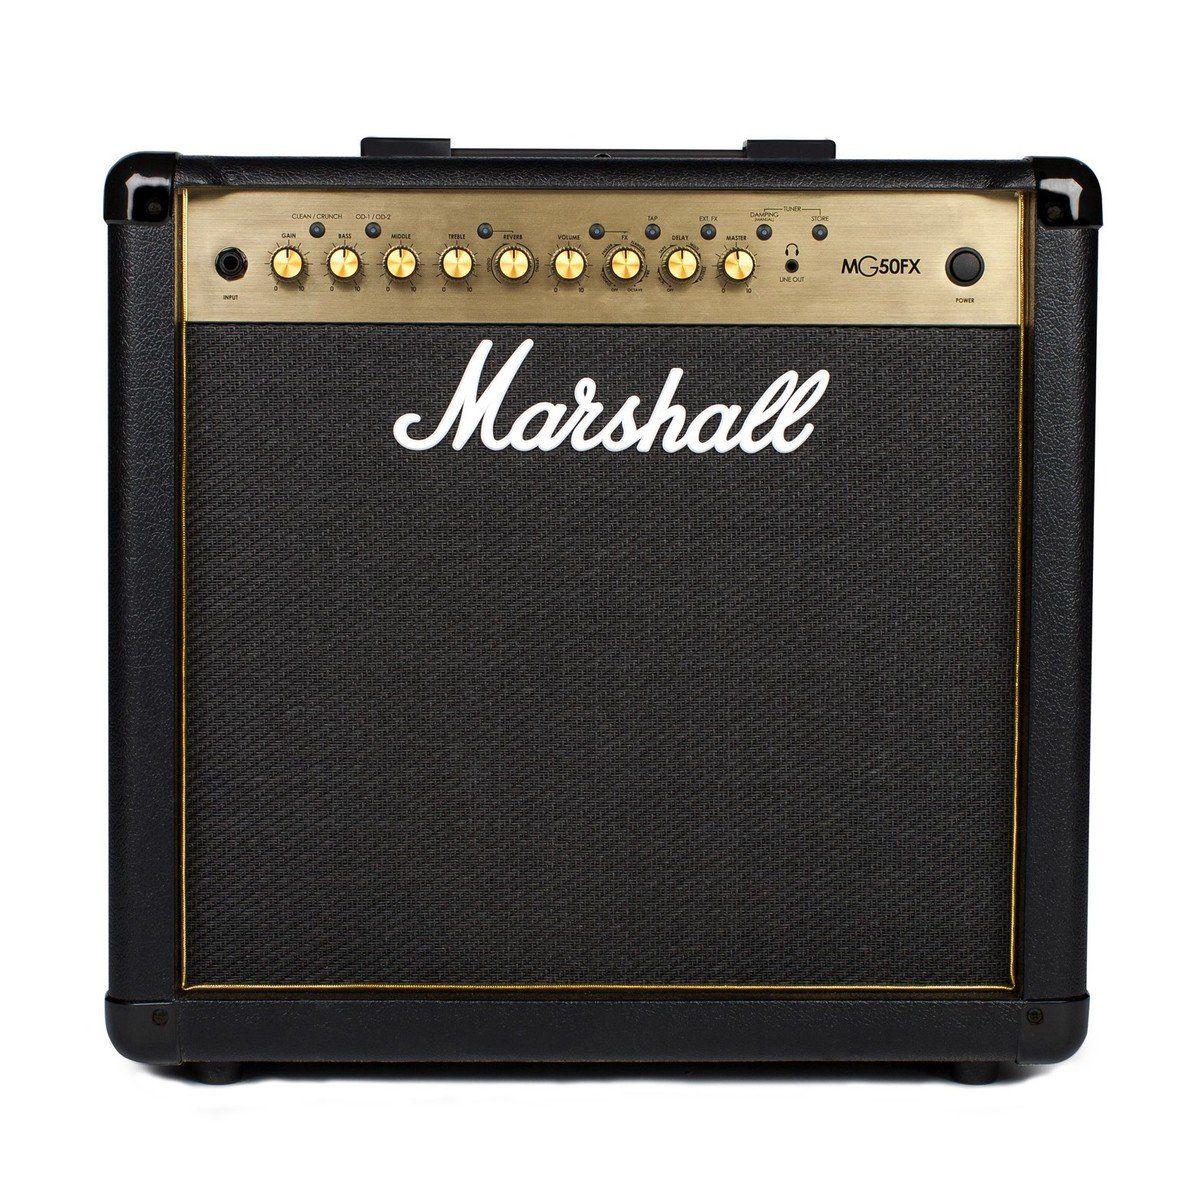 Combo para guitarra 50W - MG50GFX GOLD - MARSHALL